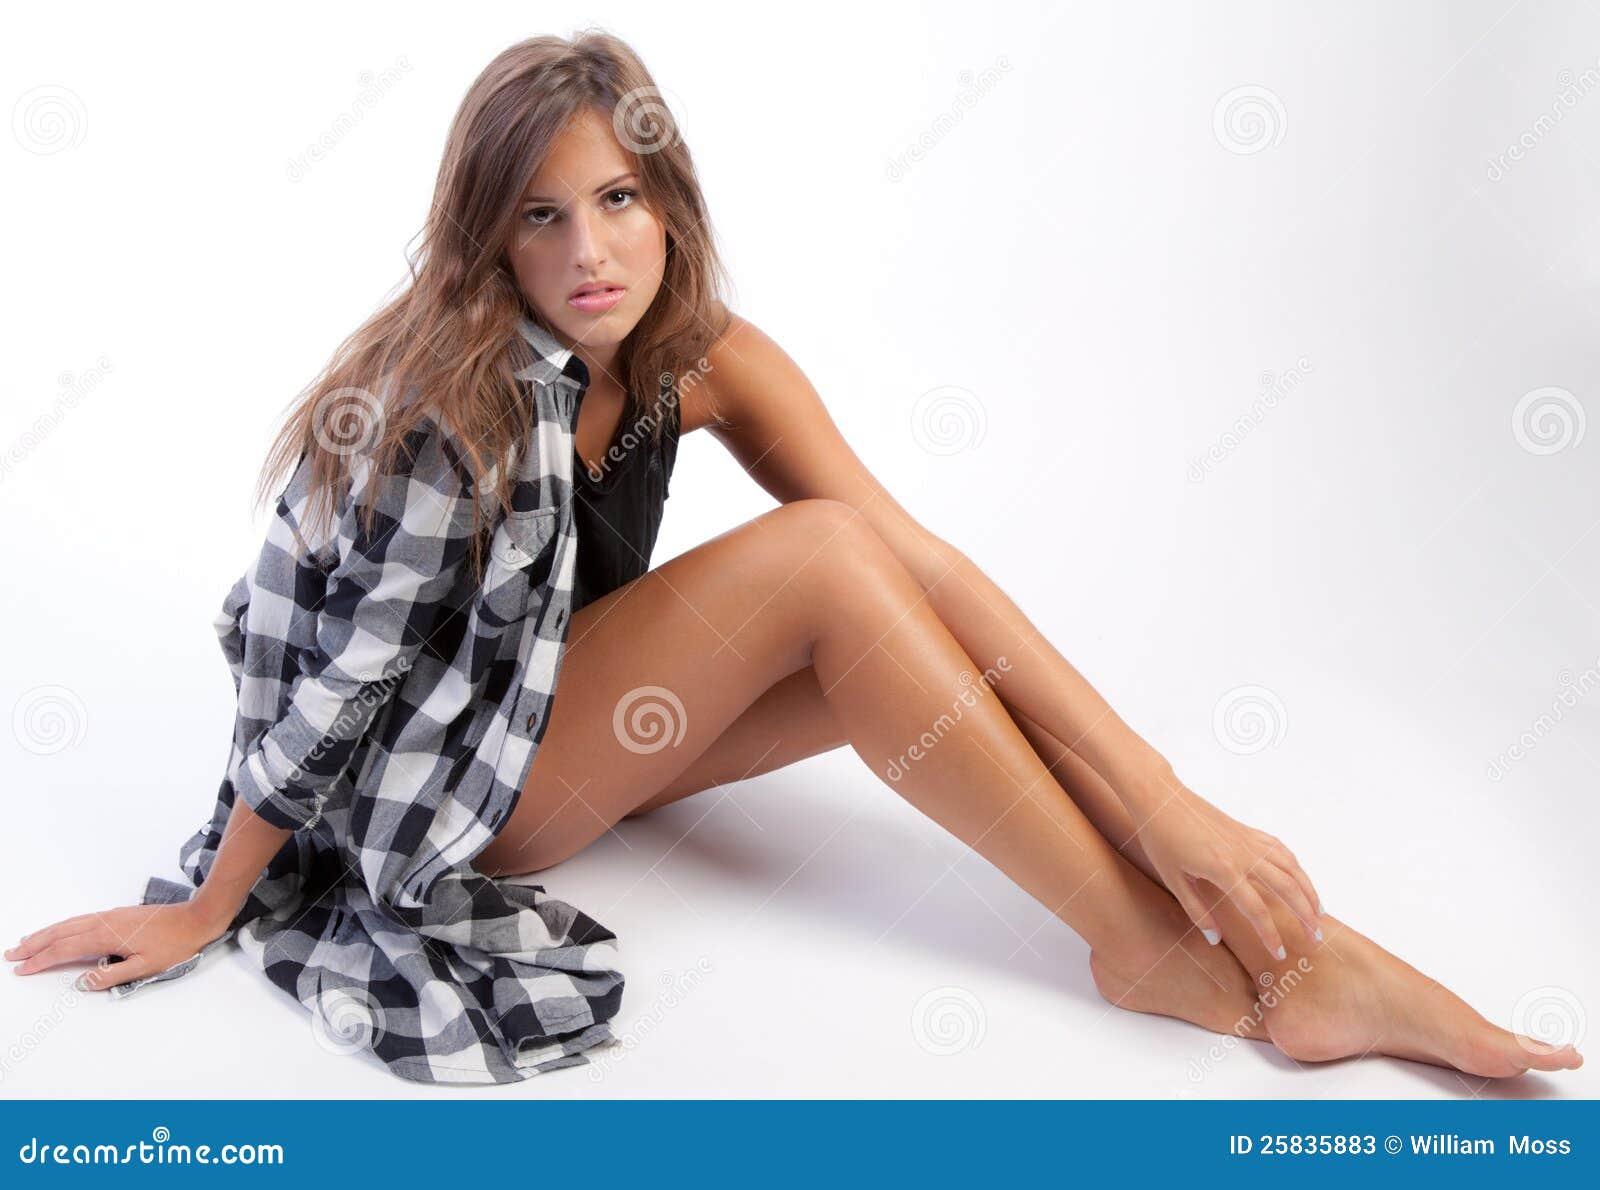 College tube cuties legs with teens long